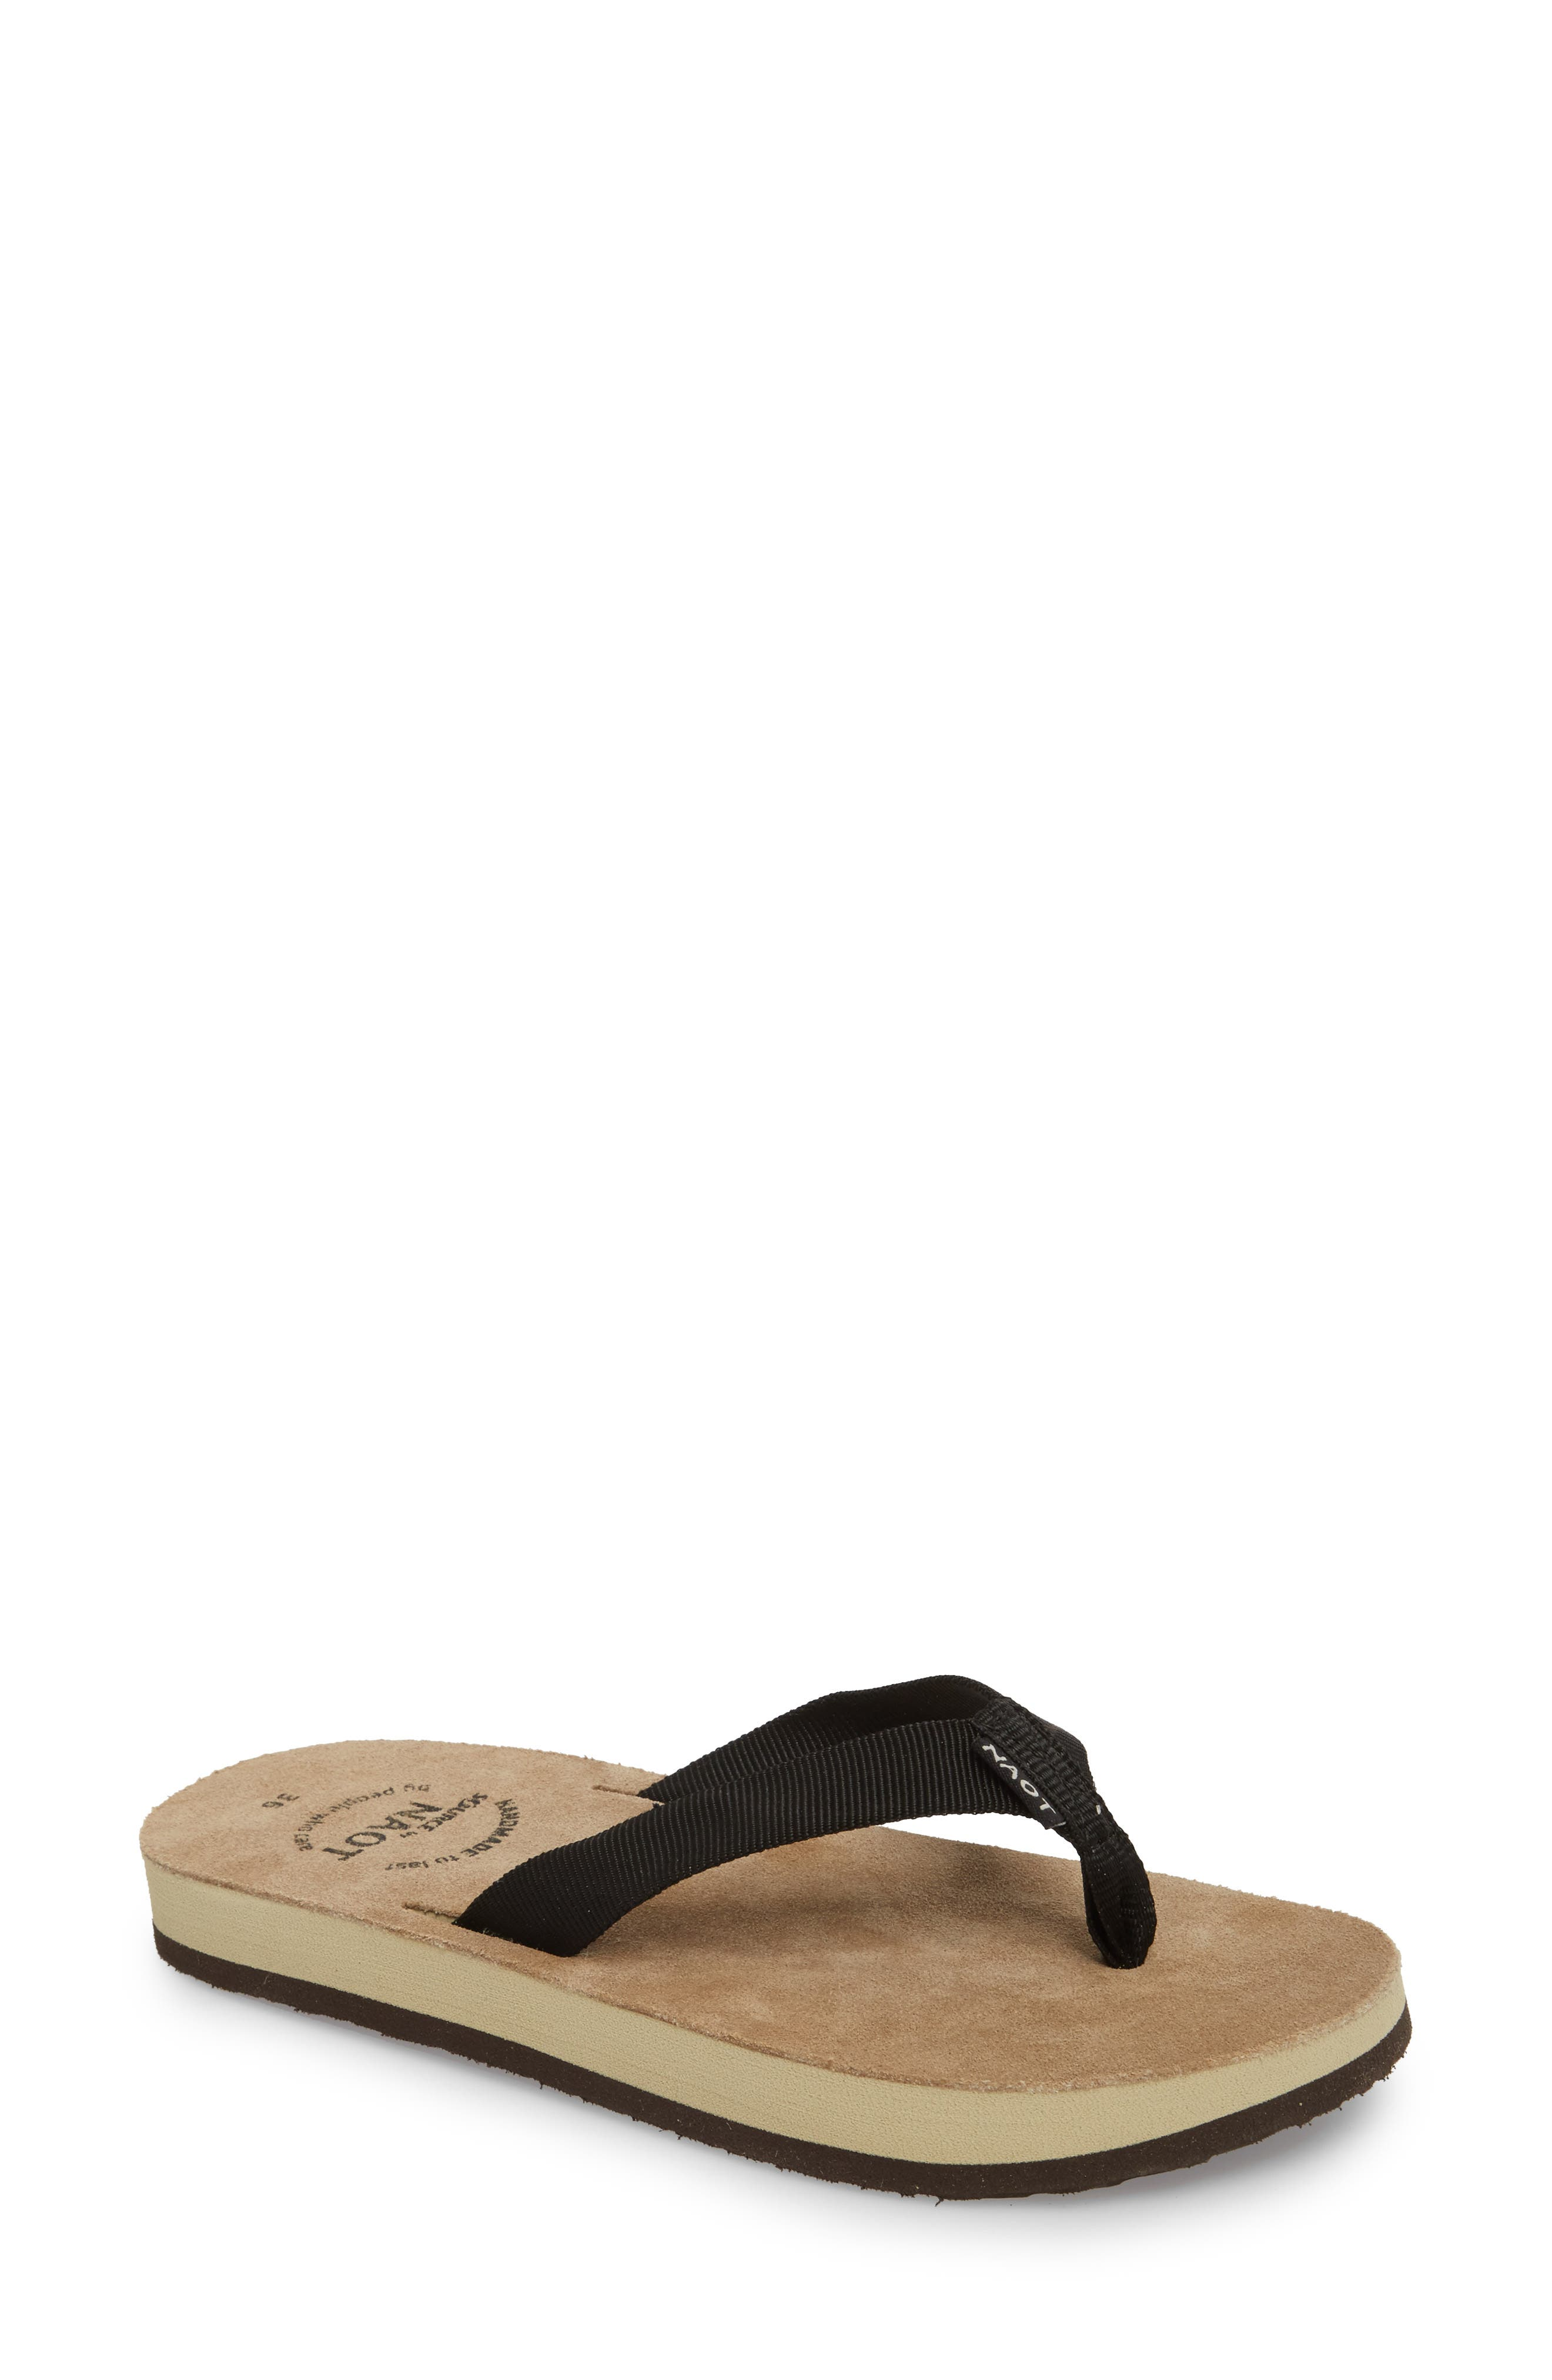 Island Flip Flop,                         Main,                         color, BLACK FABRIC